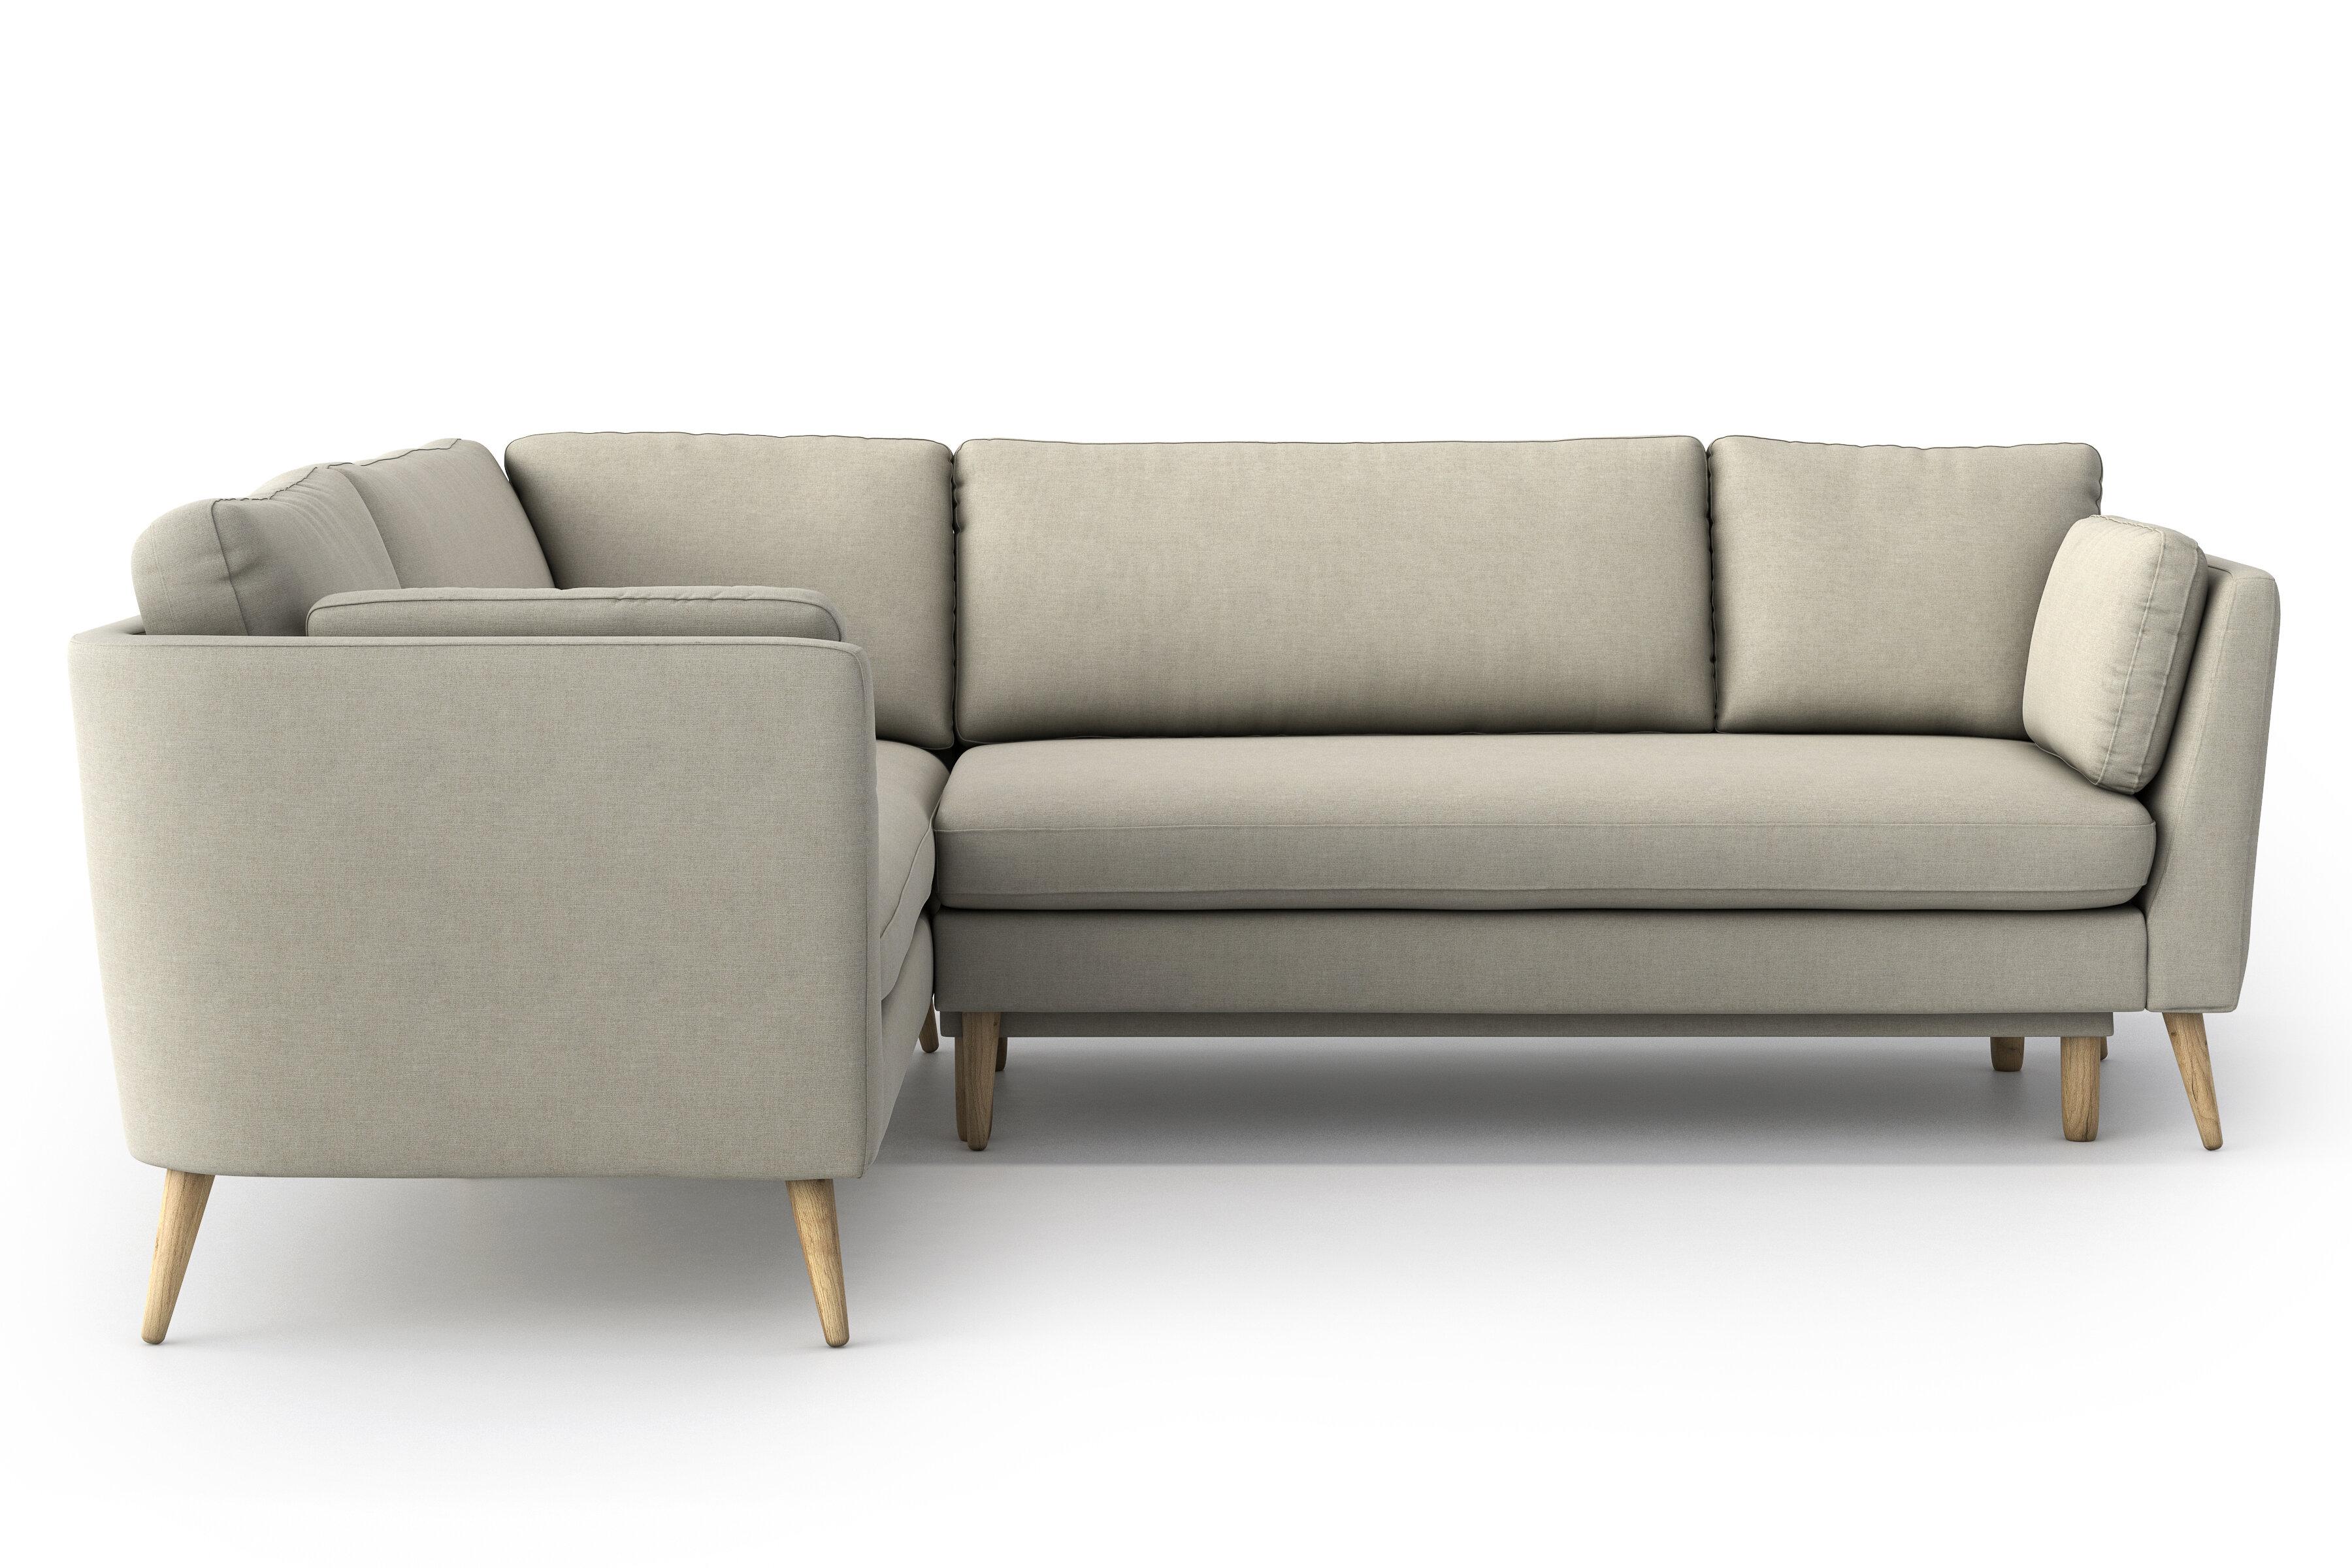 - Ebern Designs Holsey Sleeper Corner Sofa Bed Wayfair.co.uk